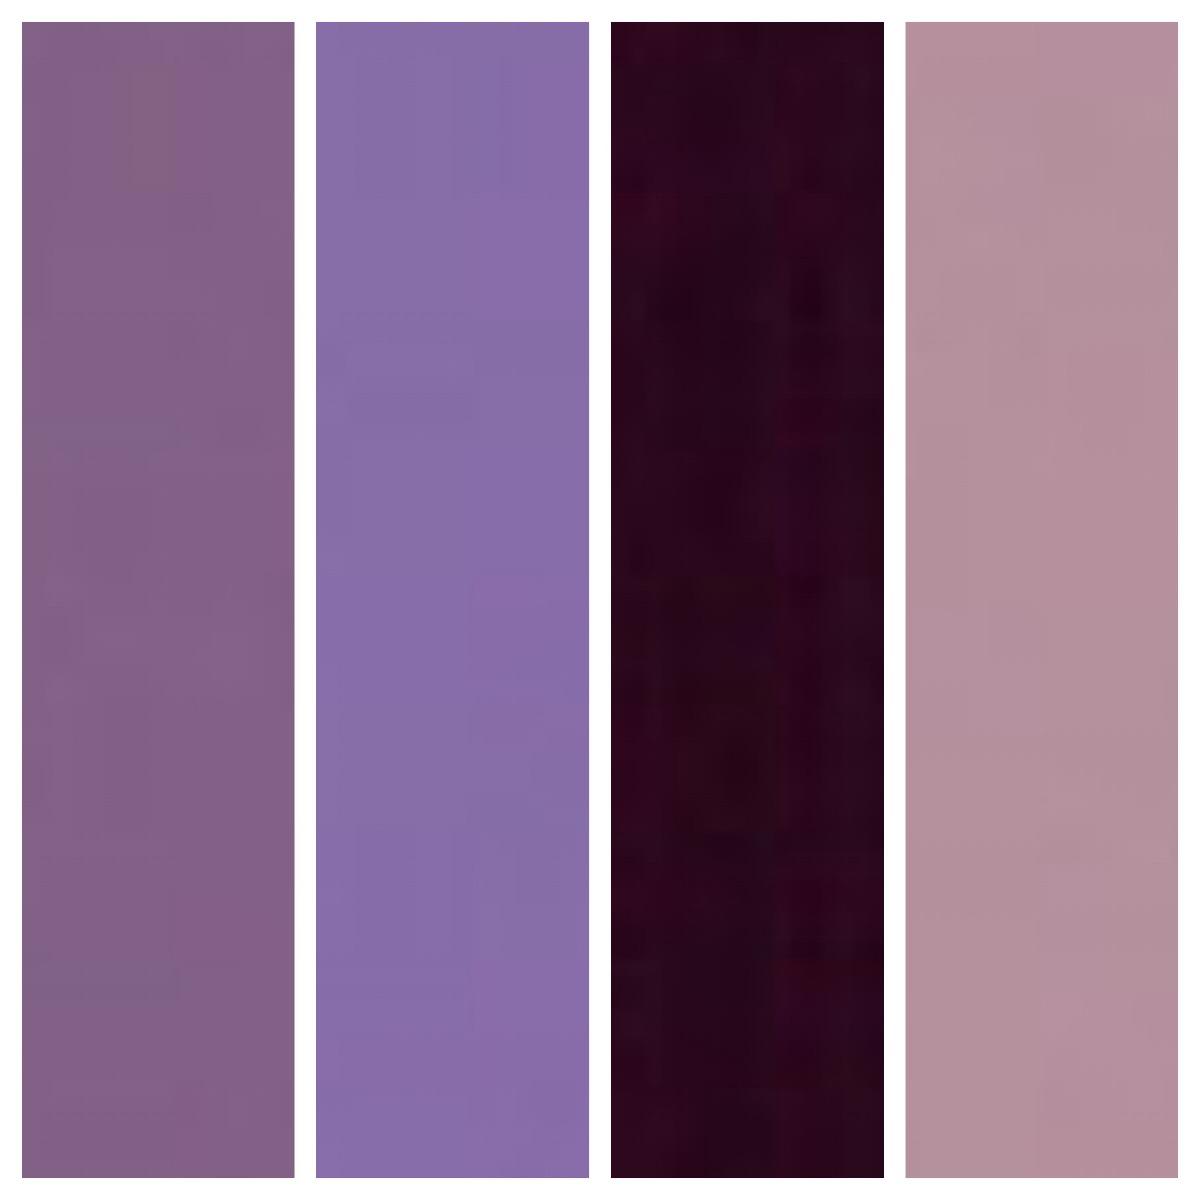 Big Chill custom colors: 4001 Red Lilac, 4005 Blue Lilac, 4007 Purple Violet, 4009 Lavender